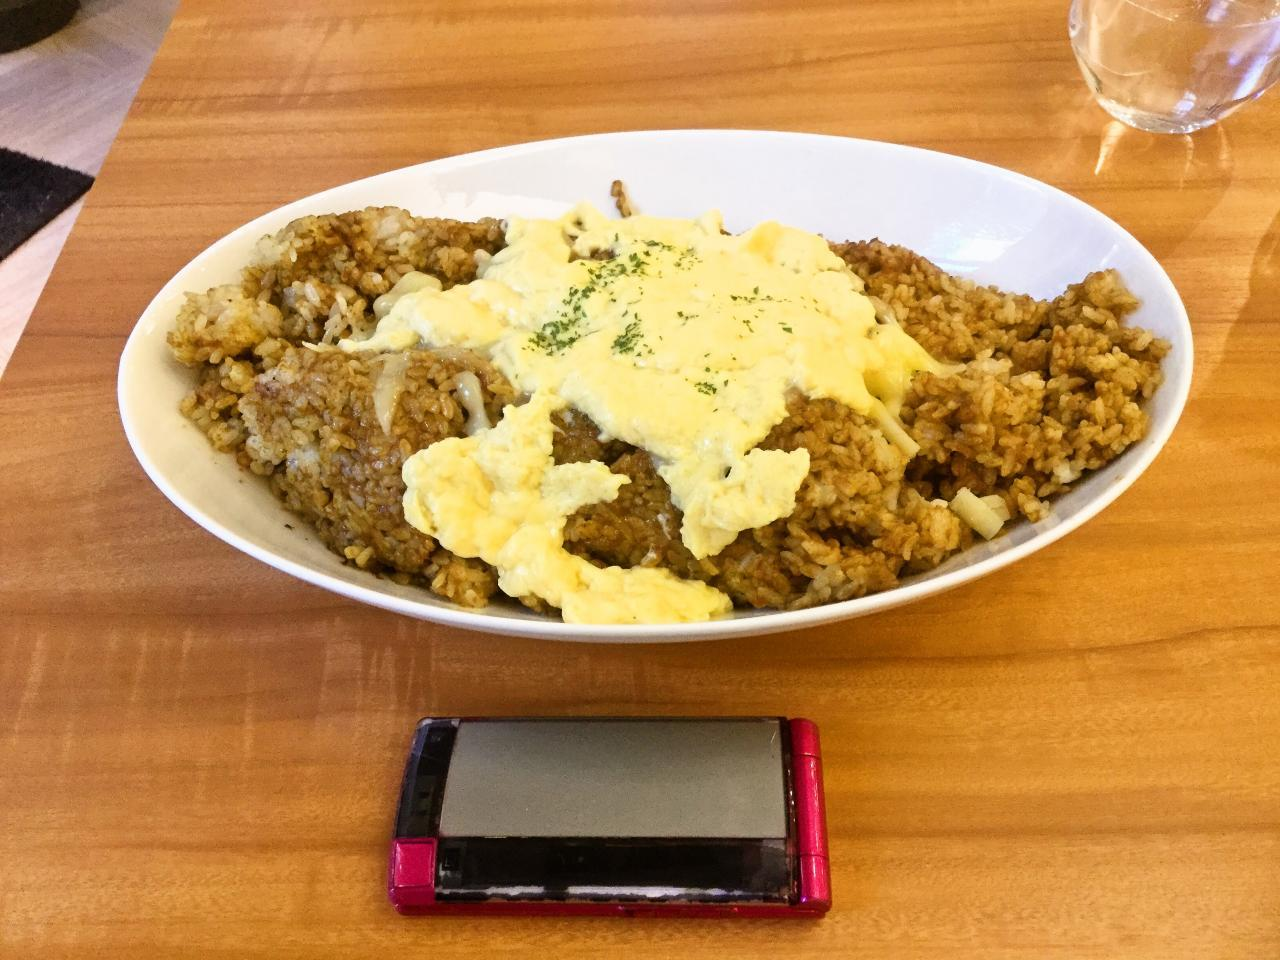 TABLE895 ラ チッタデッラ店(焼チーズオムカレー)